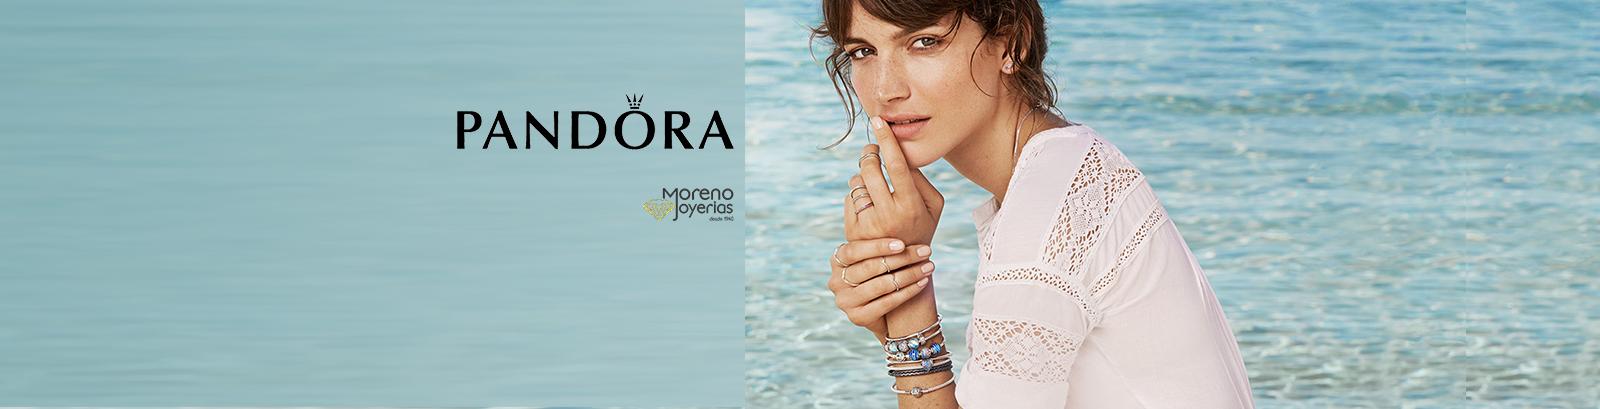 Pandora - Moreno Joyerías